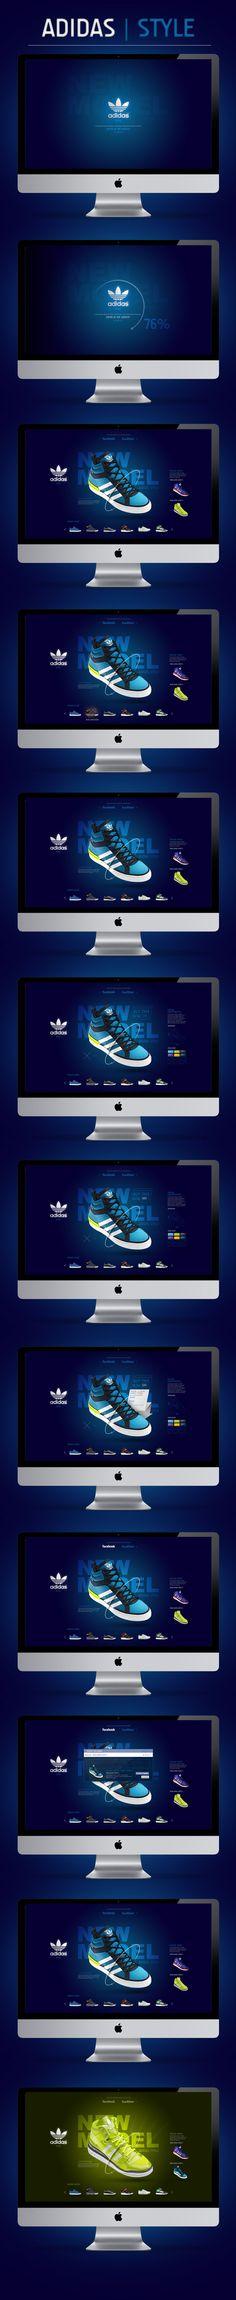 ADIDAS / LAB by João Alberto, via Behance - #web #design